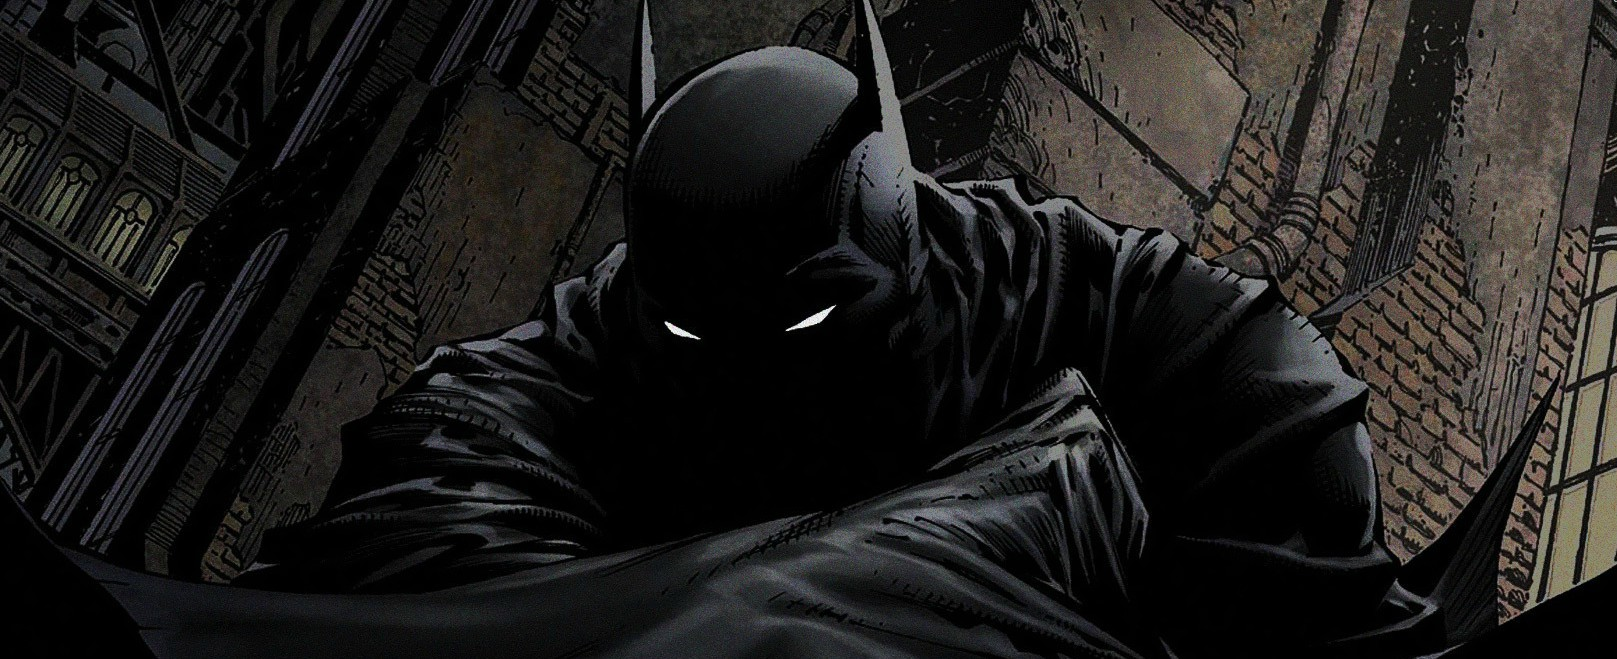 batman movie picture wallpapers backgrounds cool dark photo batman 1617x659